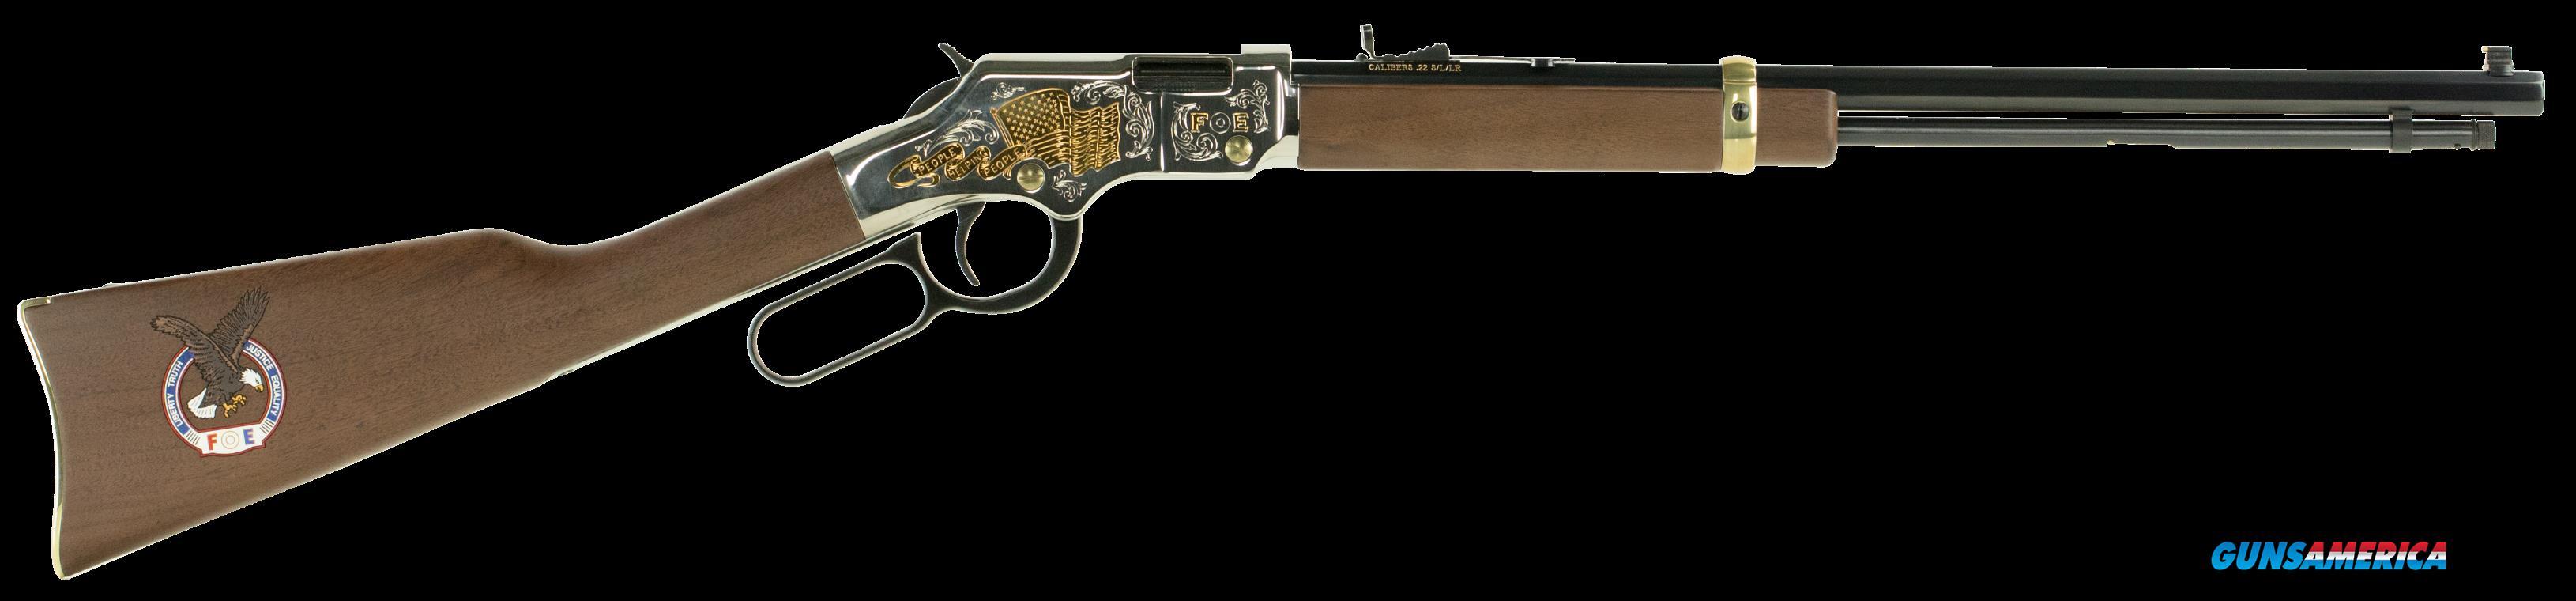 Henry Golden Boy, Henry H004foe   Golden Boy Order Of Eagles 22lr  Guns > Pistols > 1911 Pistol Copies (non-Colt)